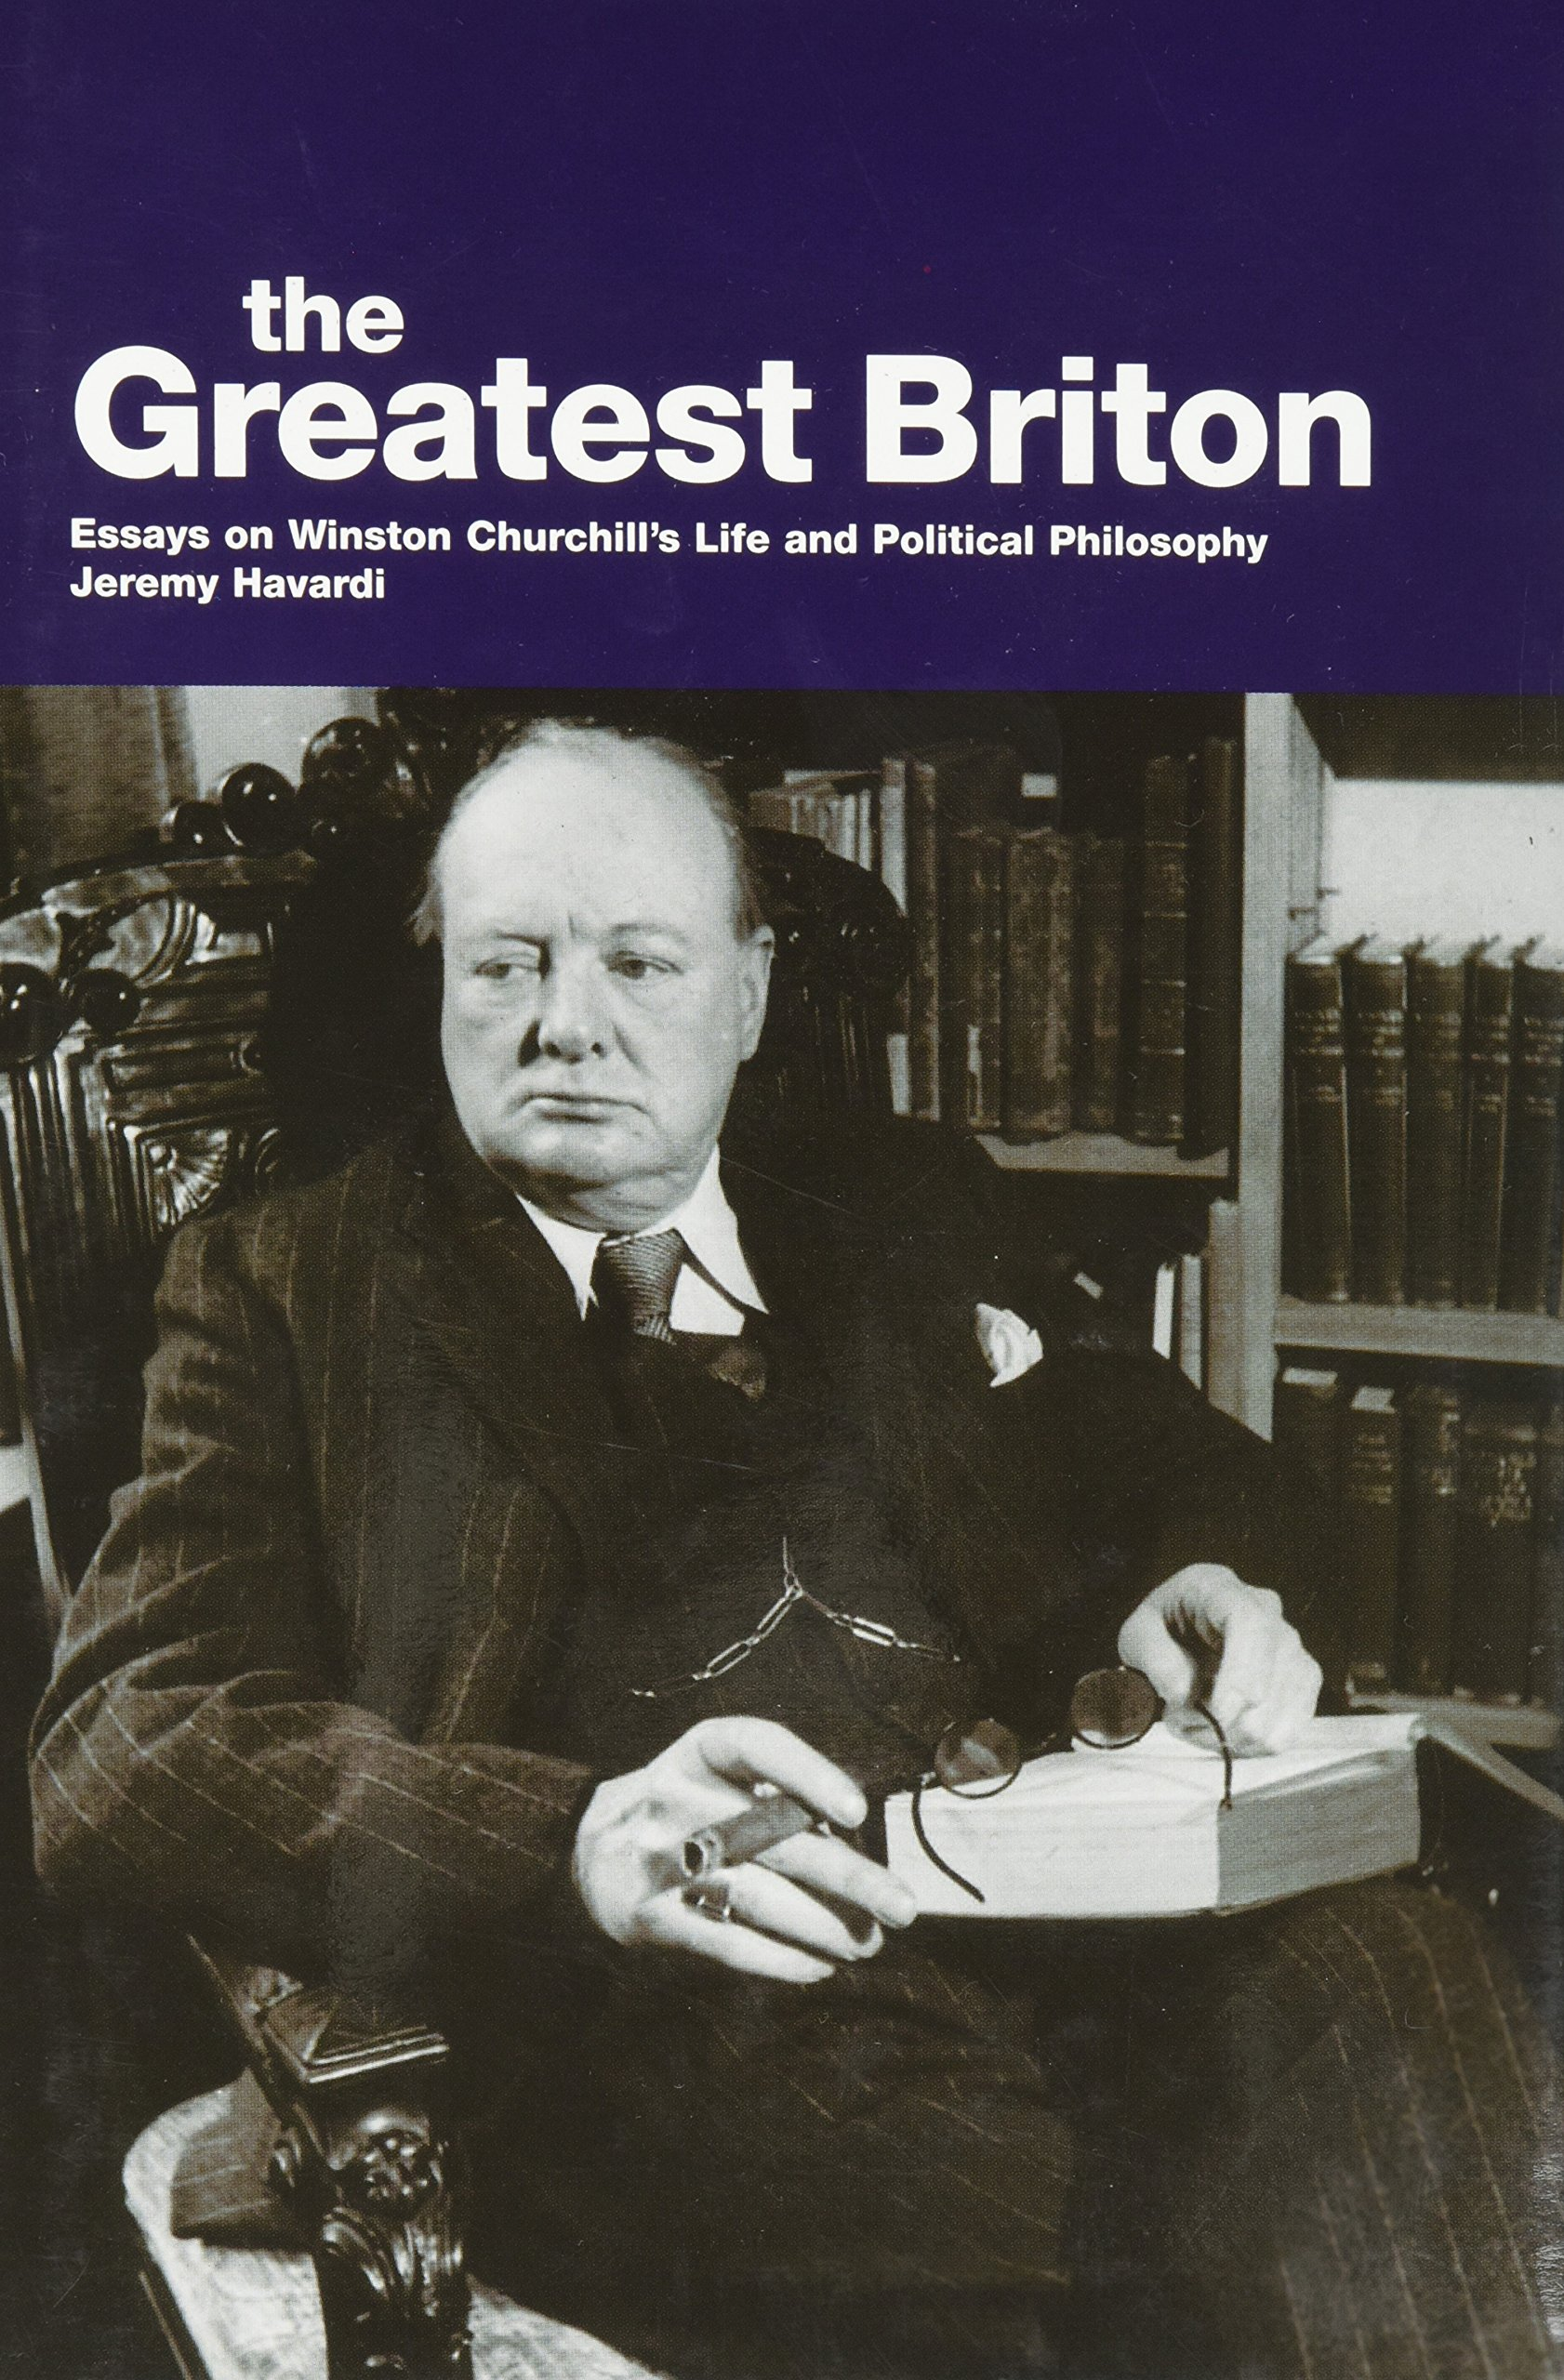 The Greatest Briton Essay On Winston Churchill S Life And Political Philosophy Havardi Jeremy 9780856832659 Amazon Com Books Collected Essays